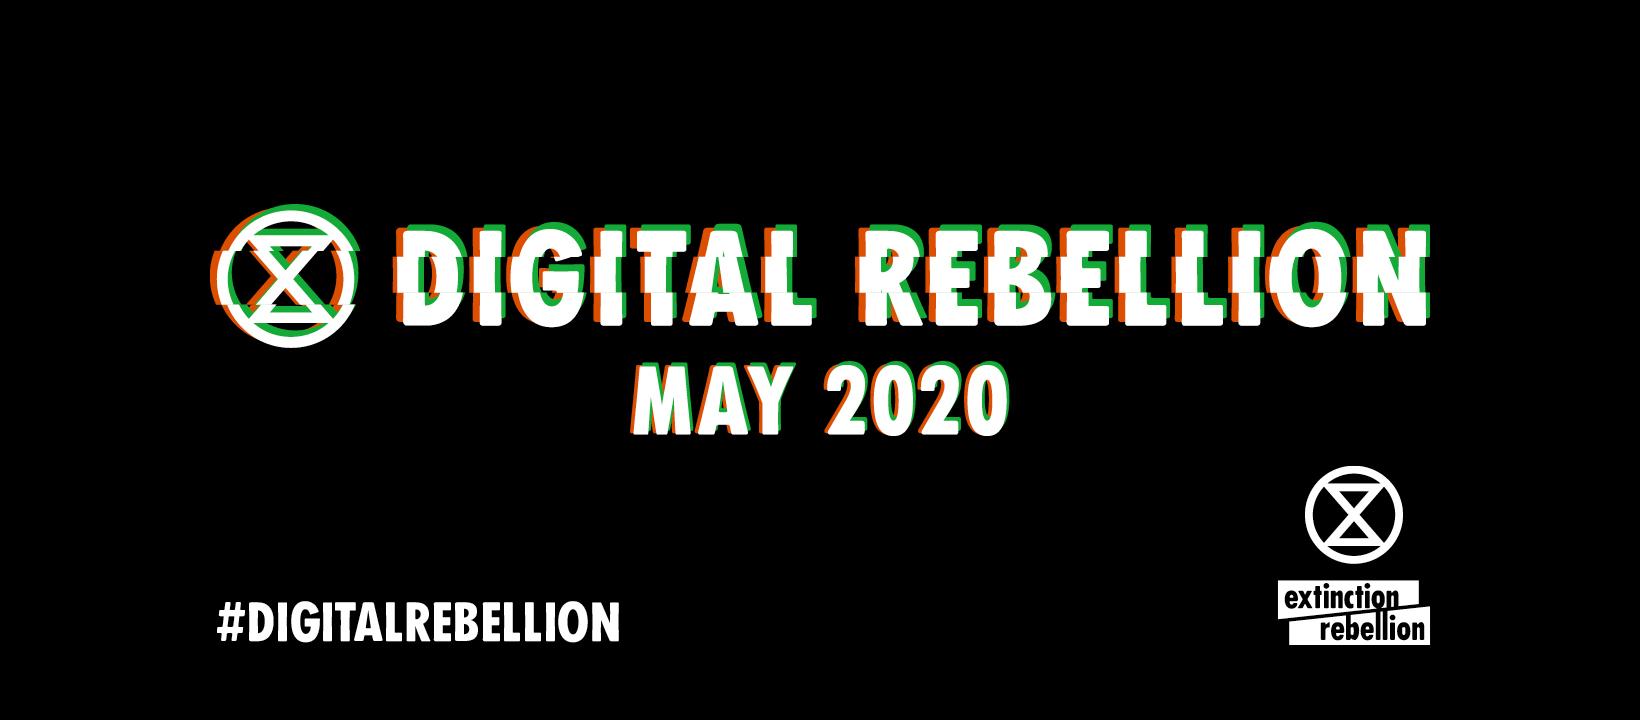 Digital-rebellion-header